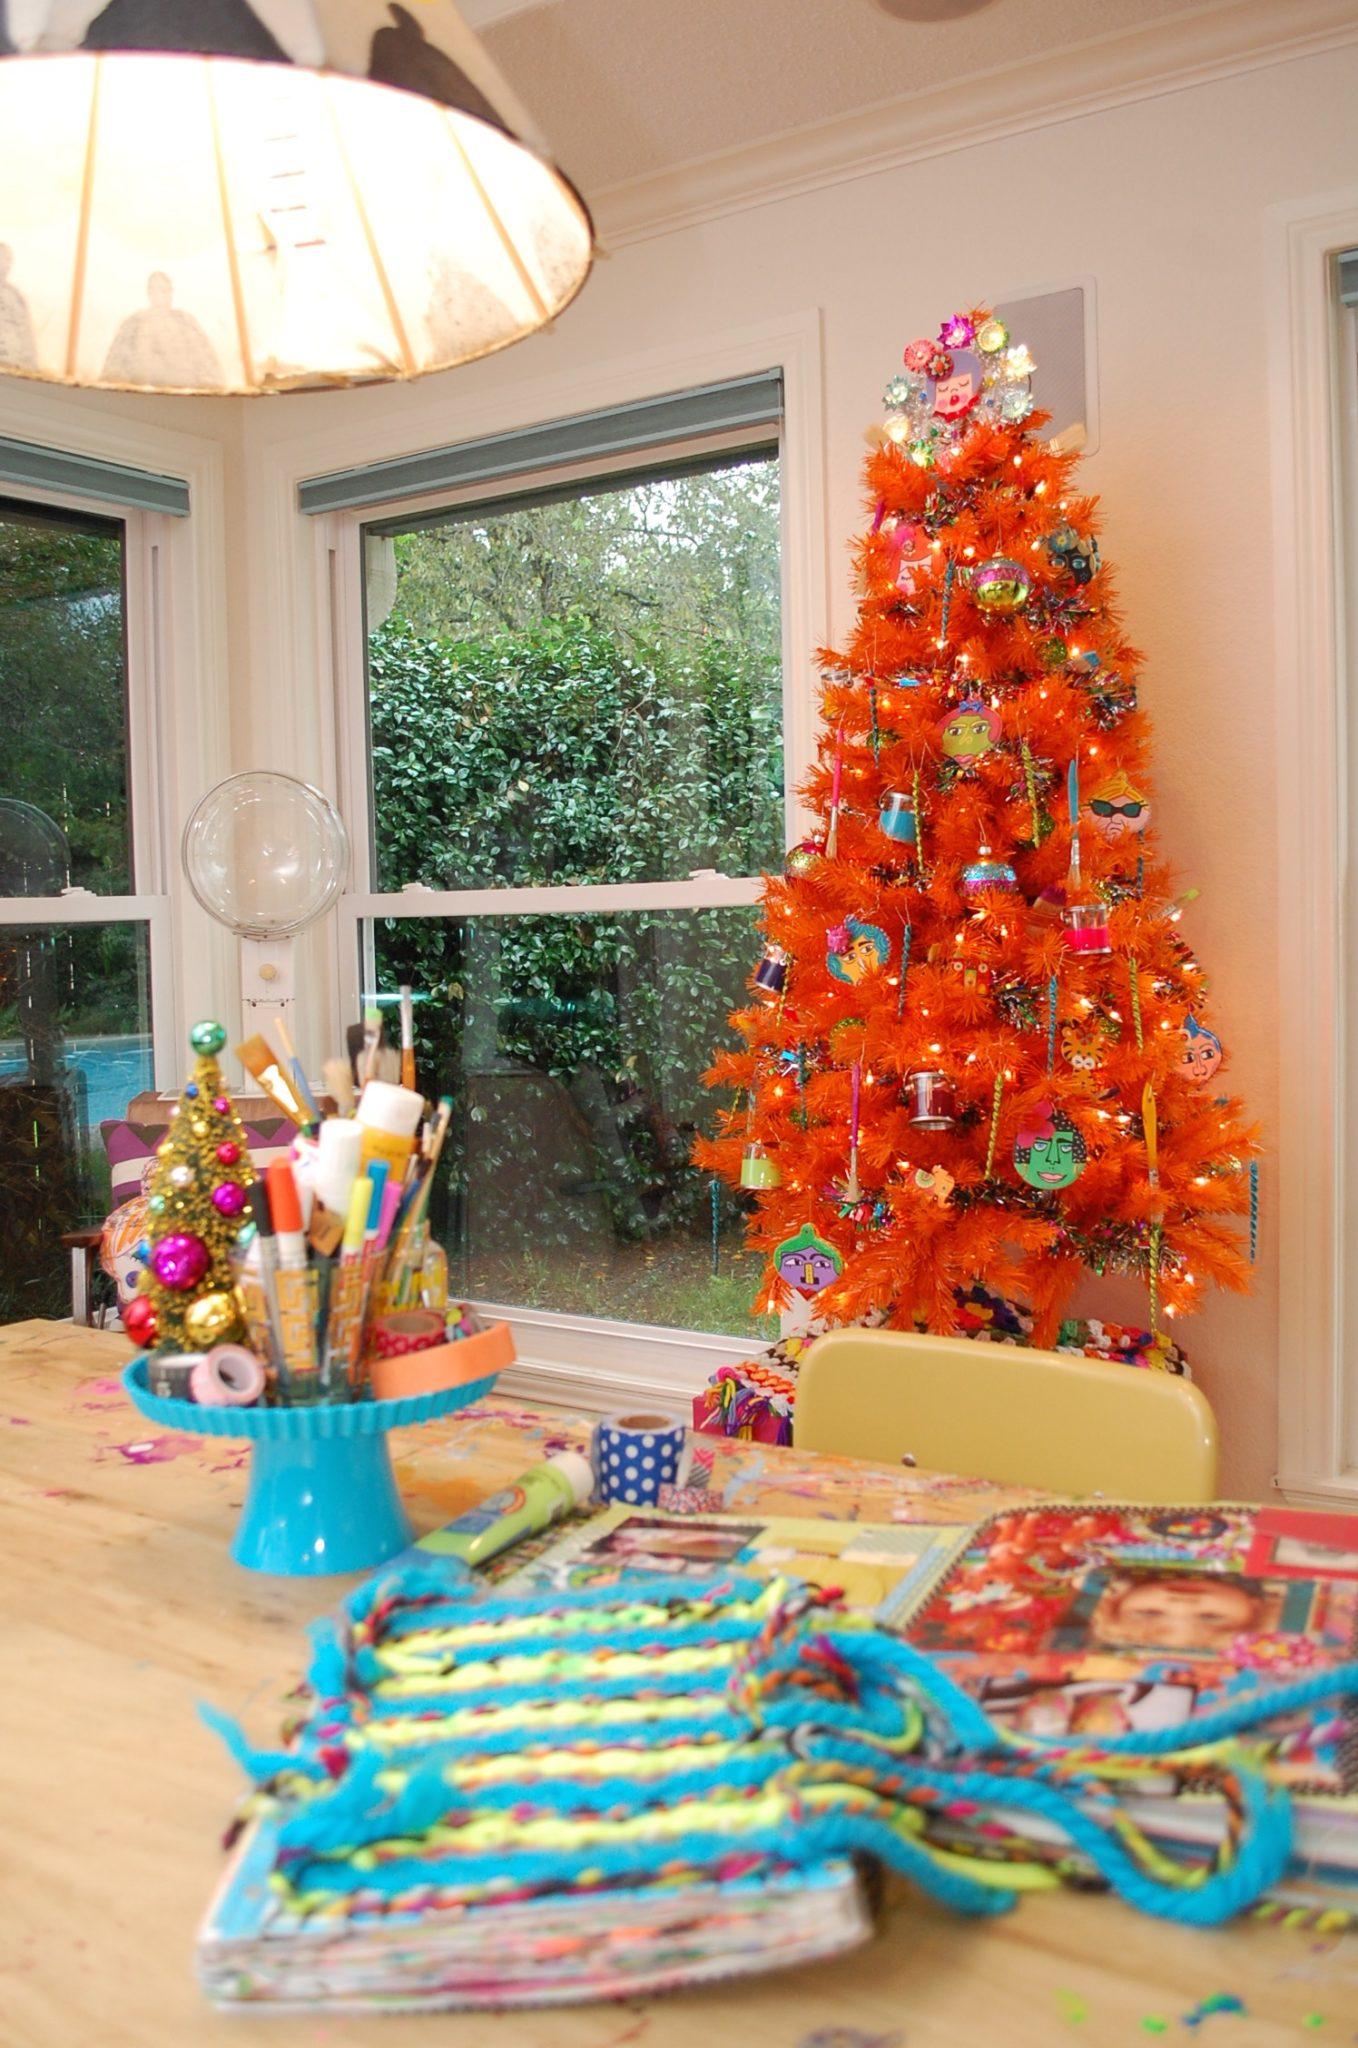 Decorating an orange Christmas Tree.